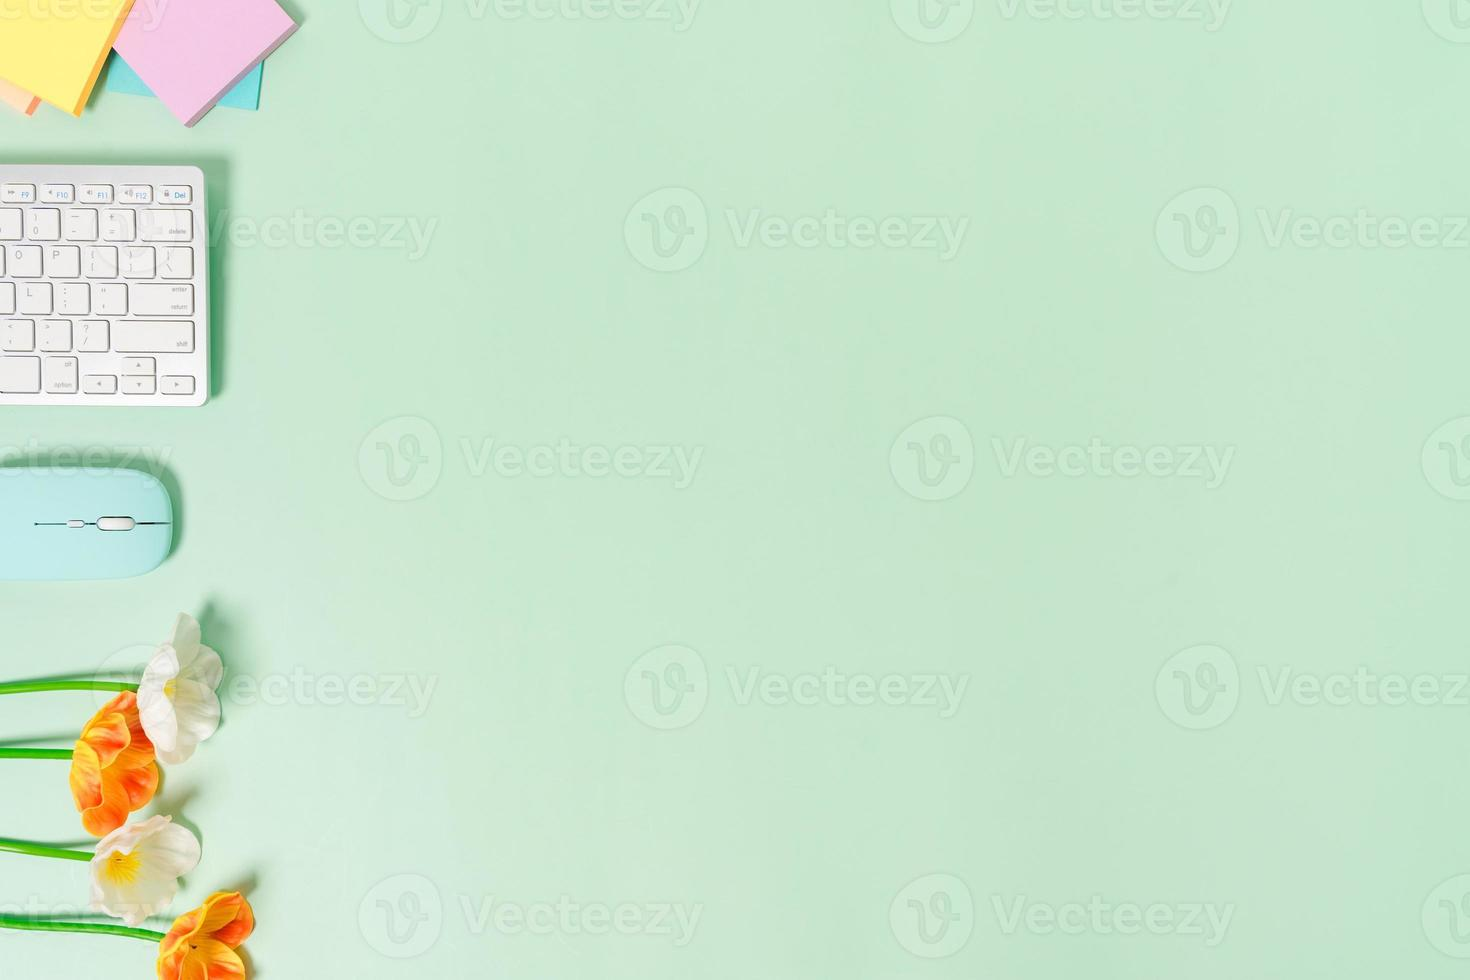 minimale werkruimte - creatieve platliggende foto van werkruimtebureau. bovenaanzicht bureau met toetsenbord en muis op pastel groene kleur achtergrond. bovenaanzicht met kopieerruimte, platliggende fotografie.